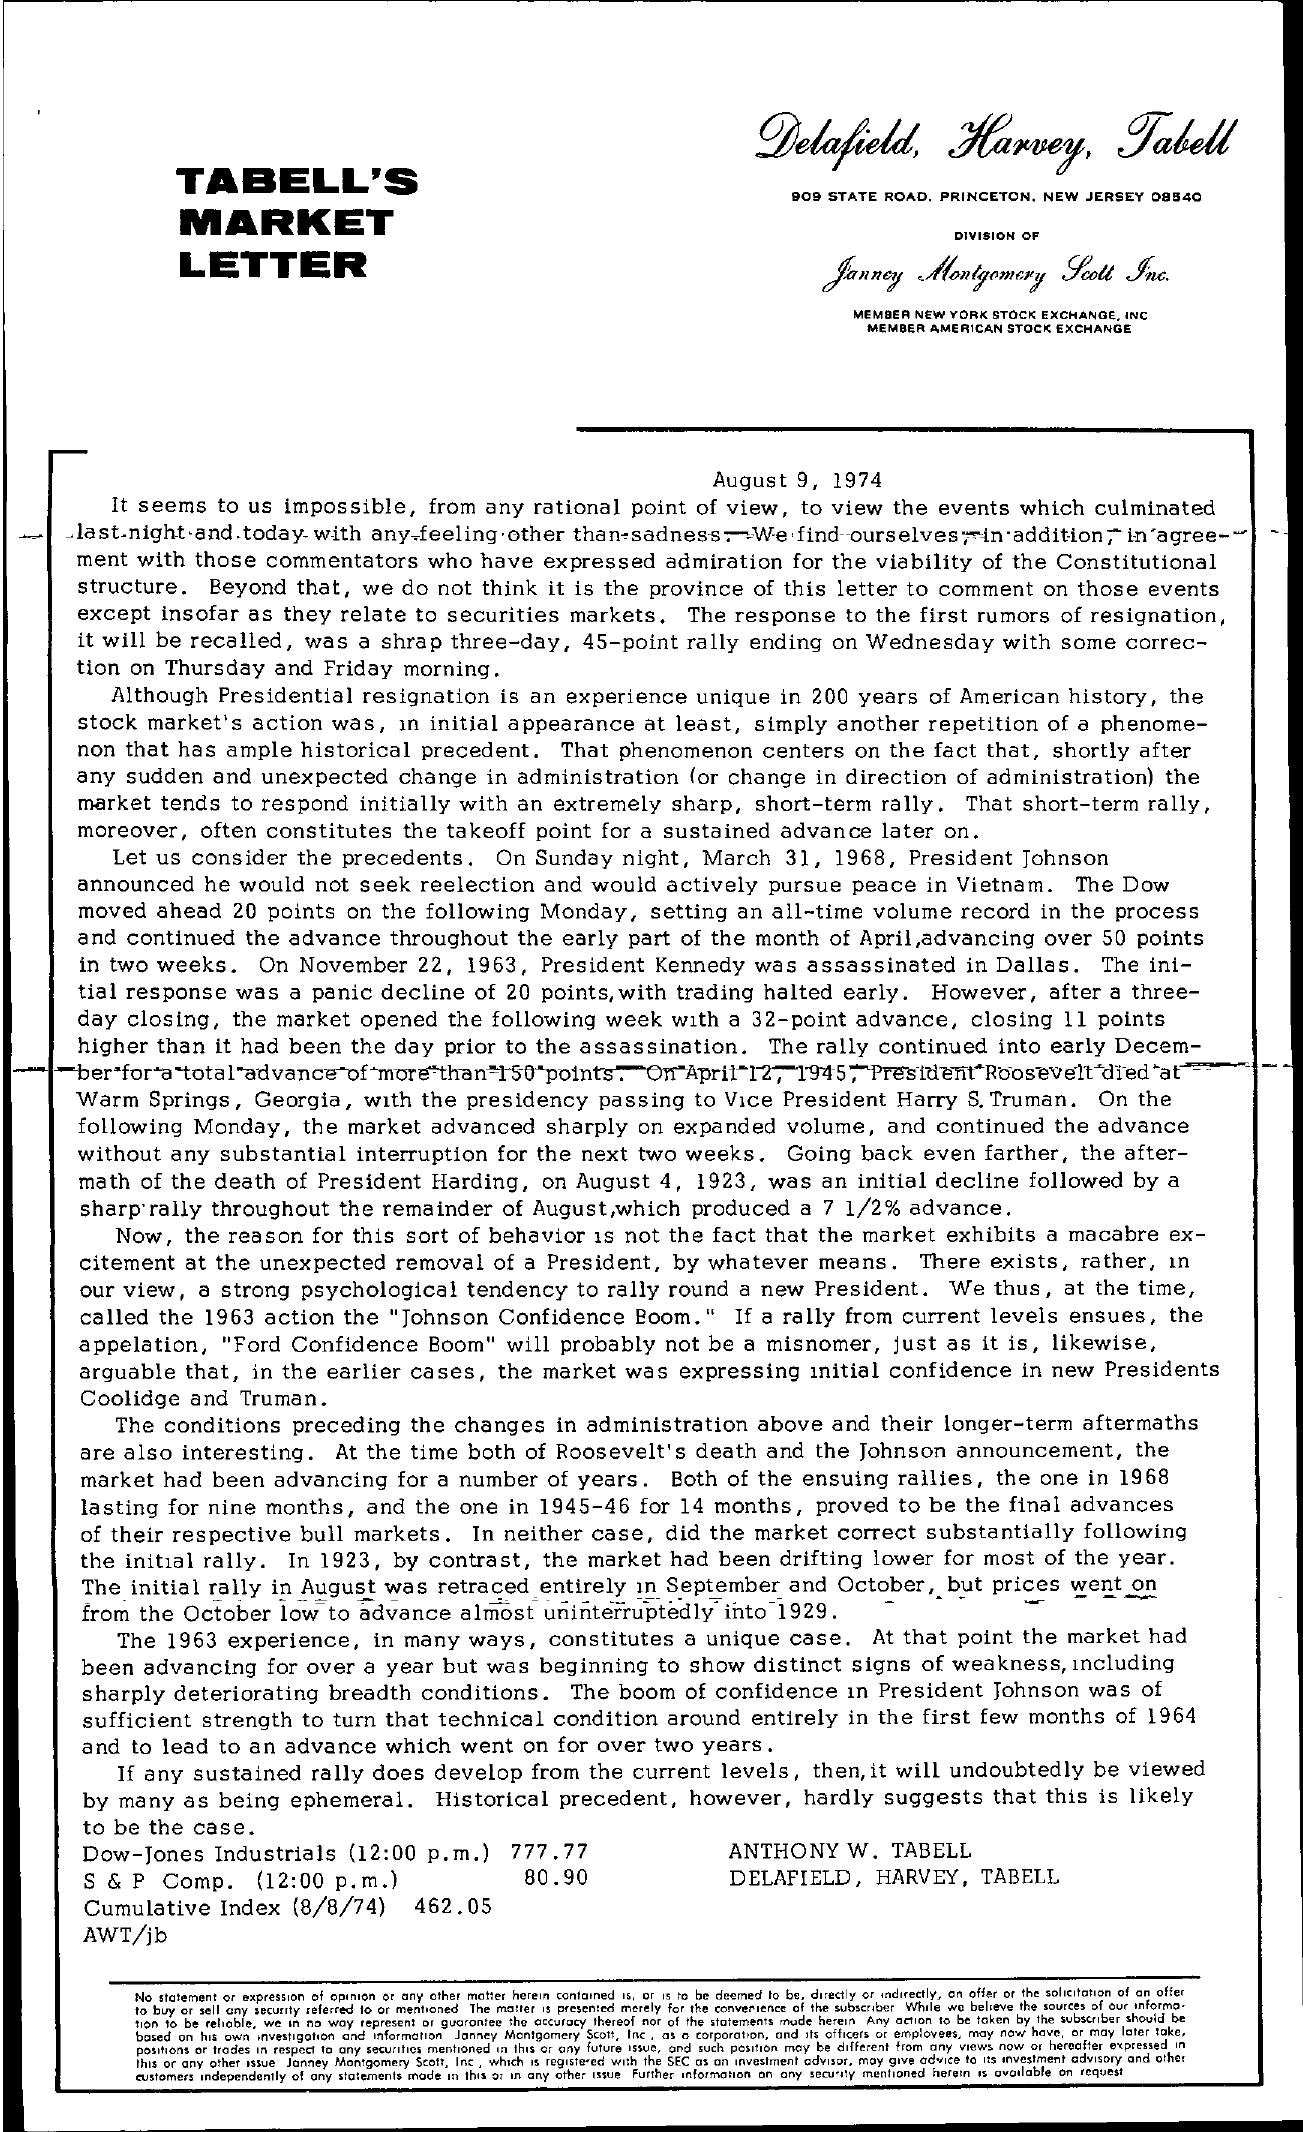 Tabell's Market Letter - August 09, 1974